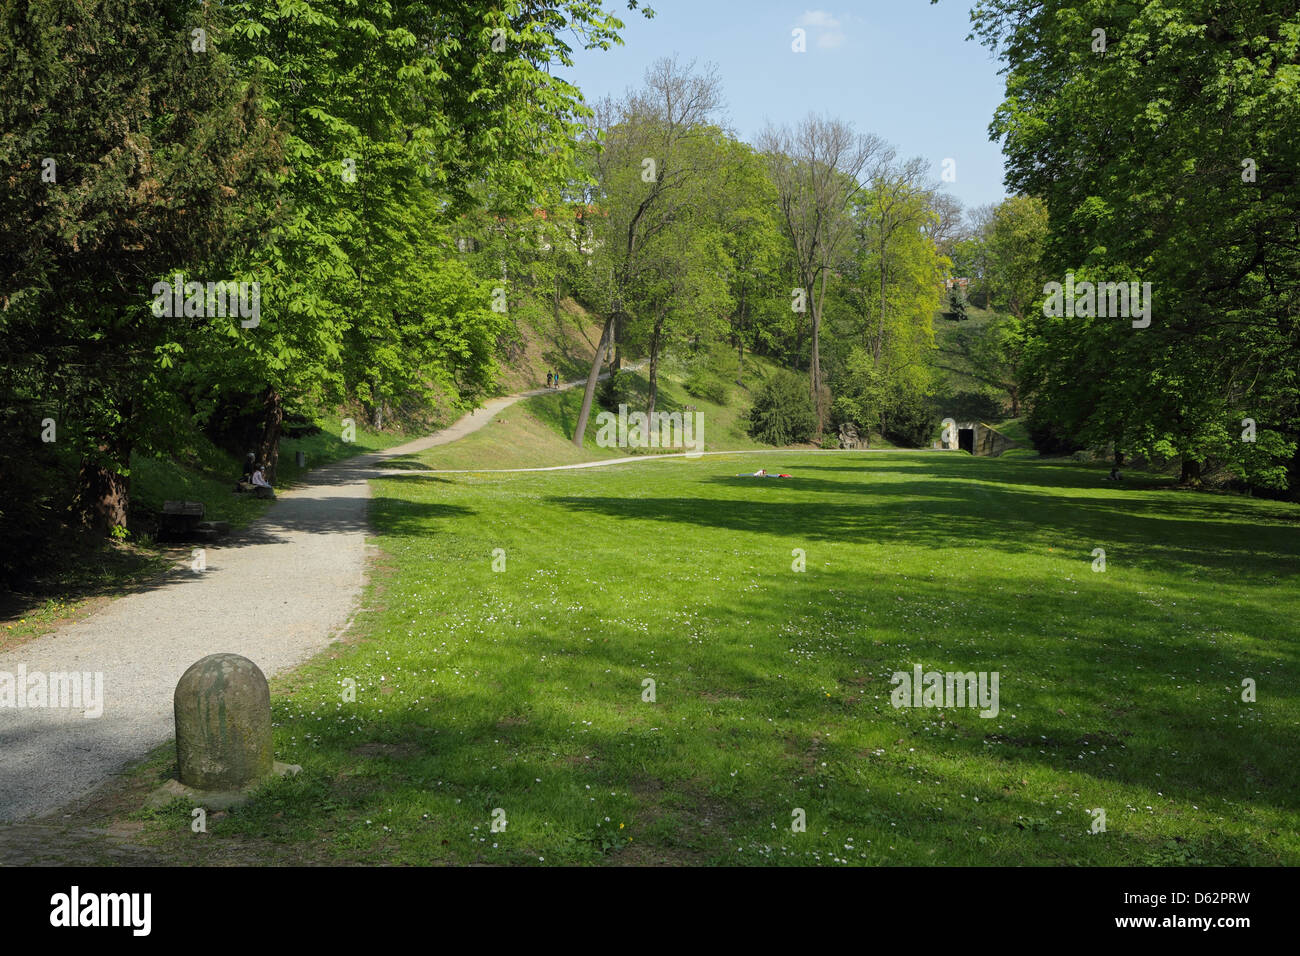 Letná Park is a large park on Letná hill, Prague Stock Photo